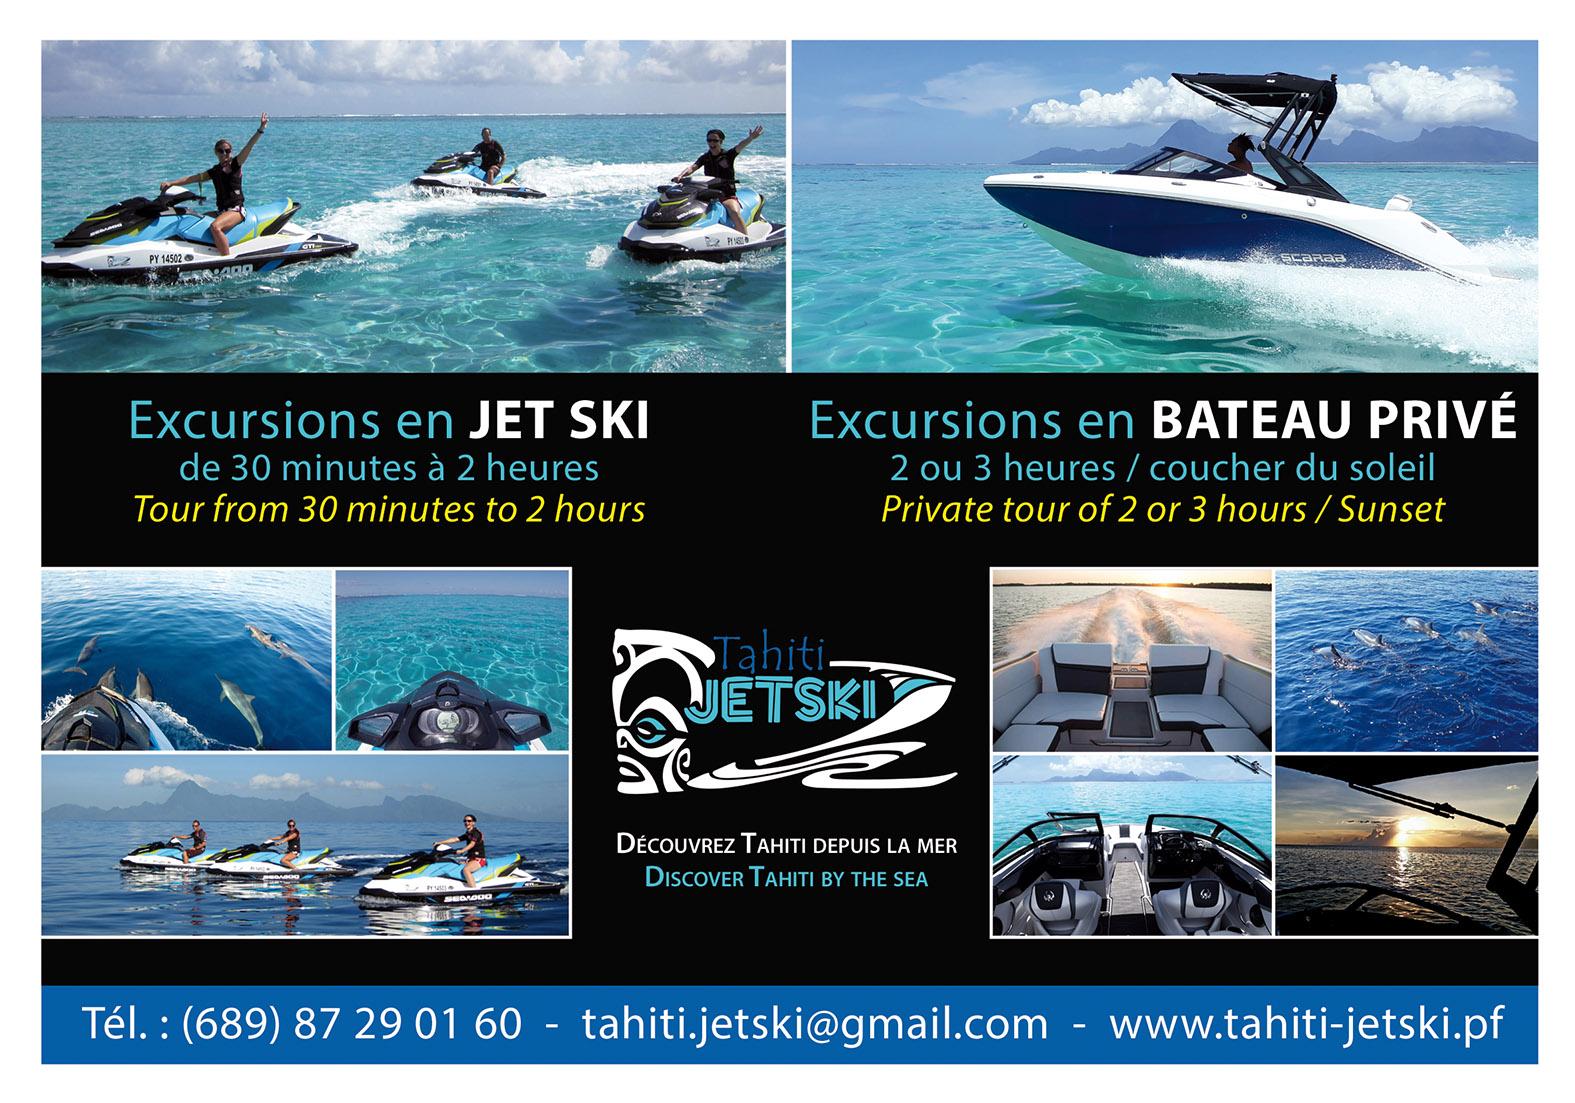 https://tahititourisme.ch/wp-content/uploads/2017/08/Tahiti-Jet-Ski-190x130-sept-2.jpg